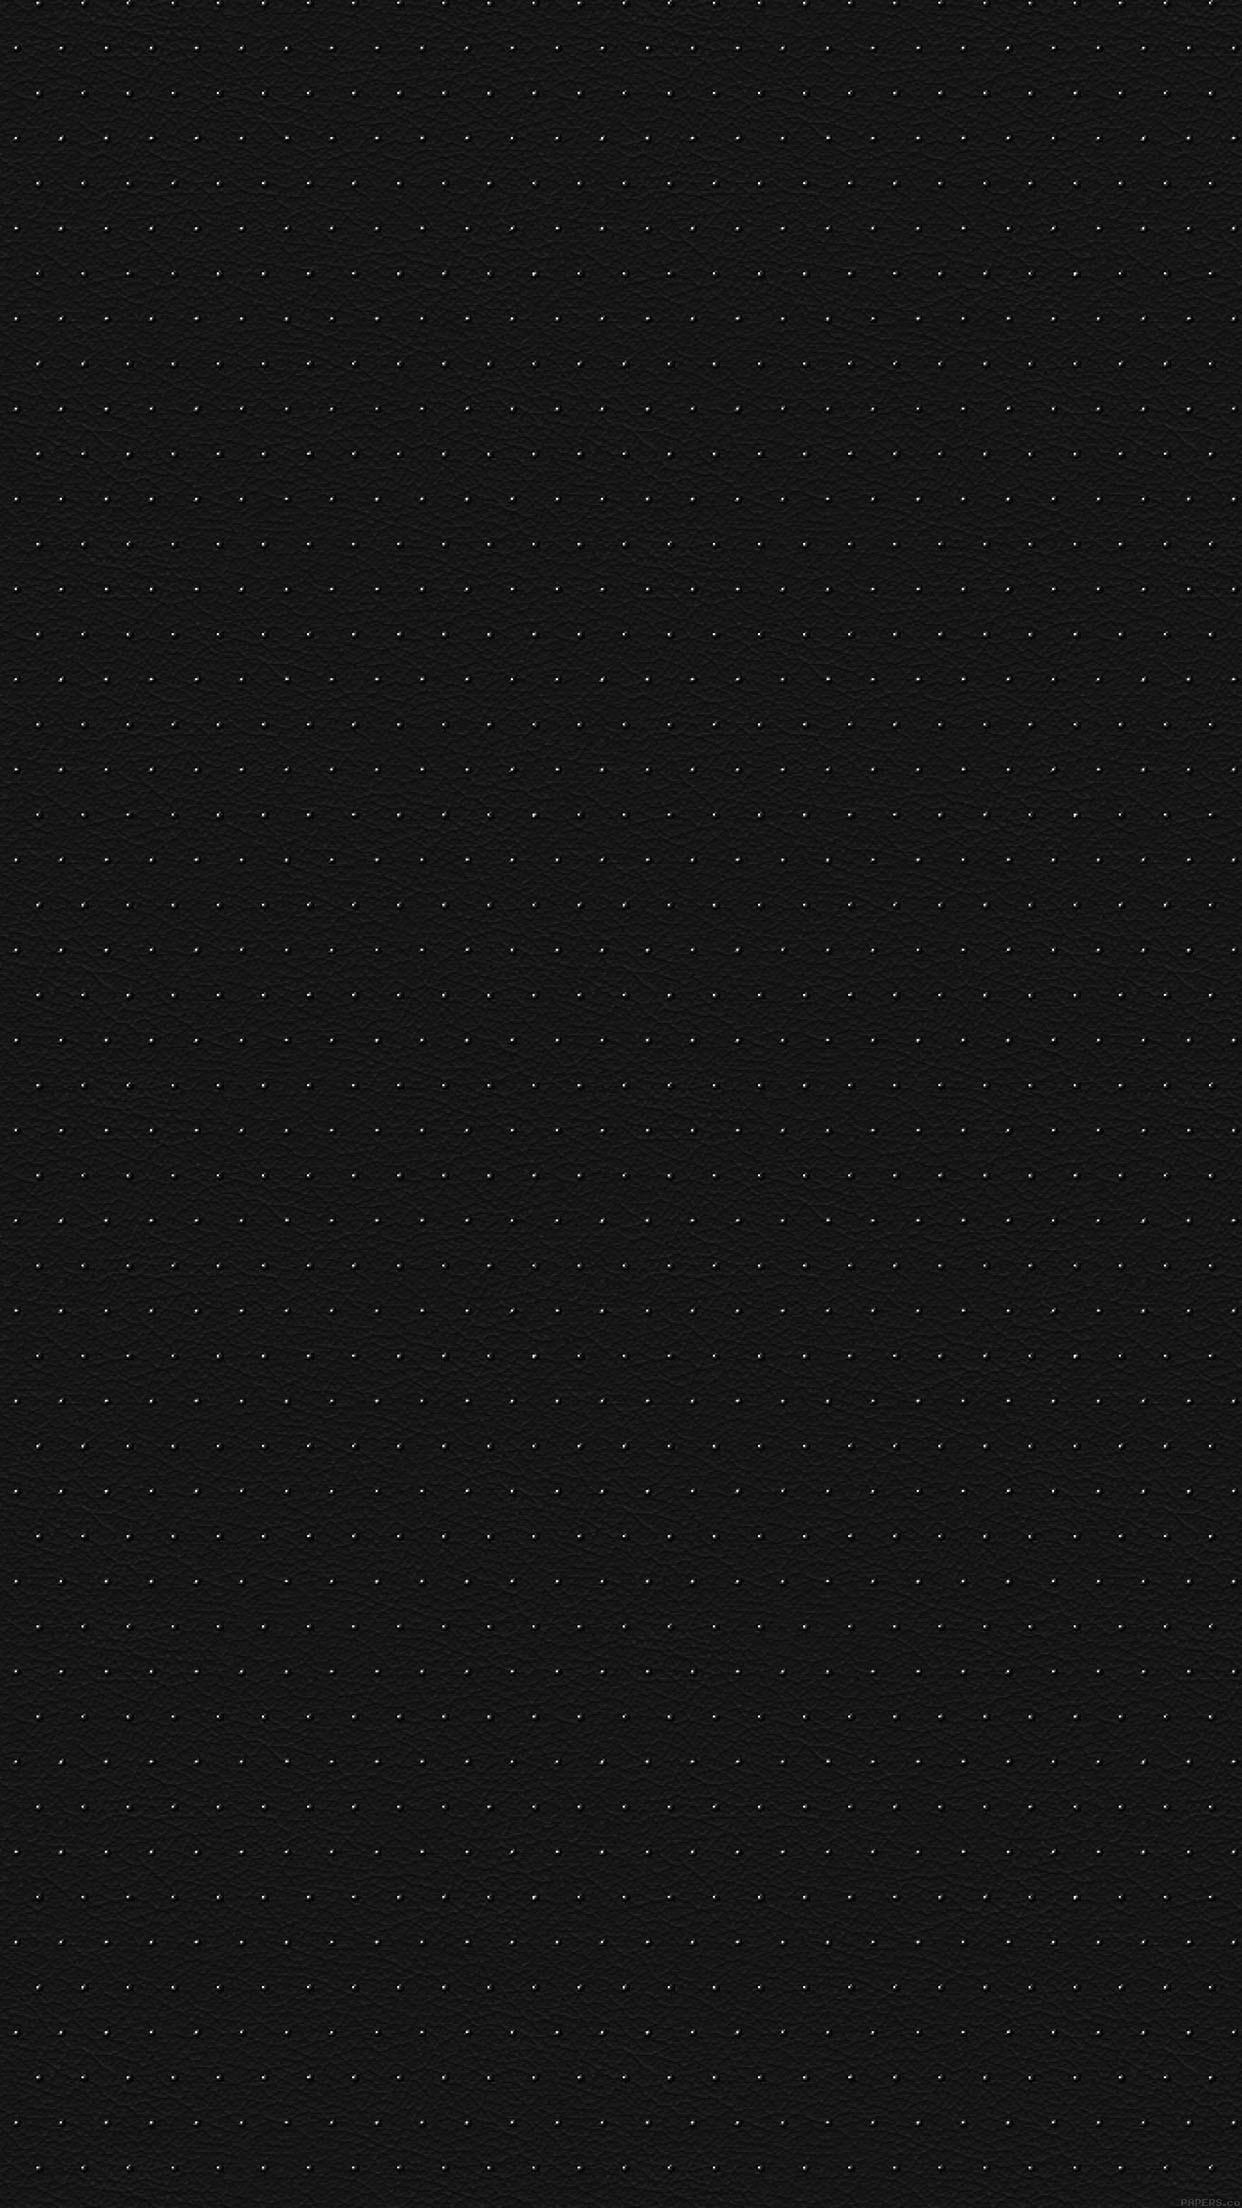 Solid Dark Grey Wallpaper (68+ Images